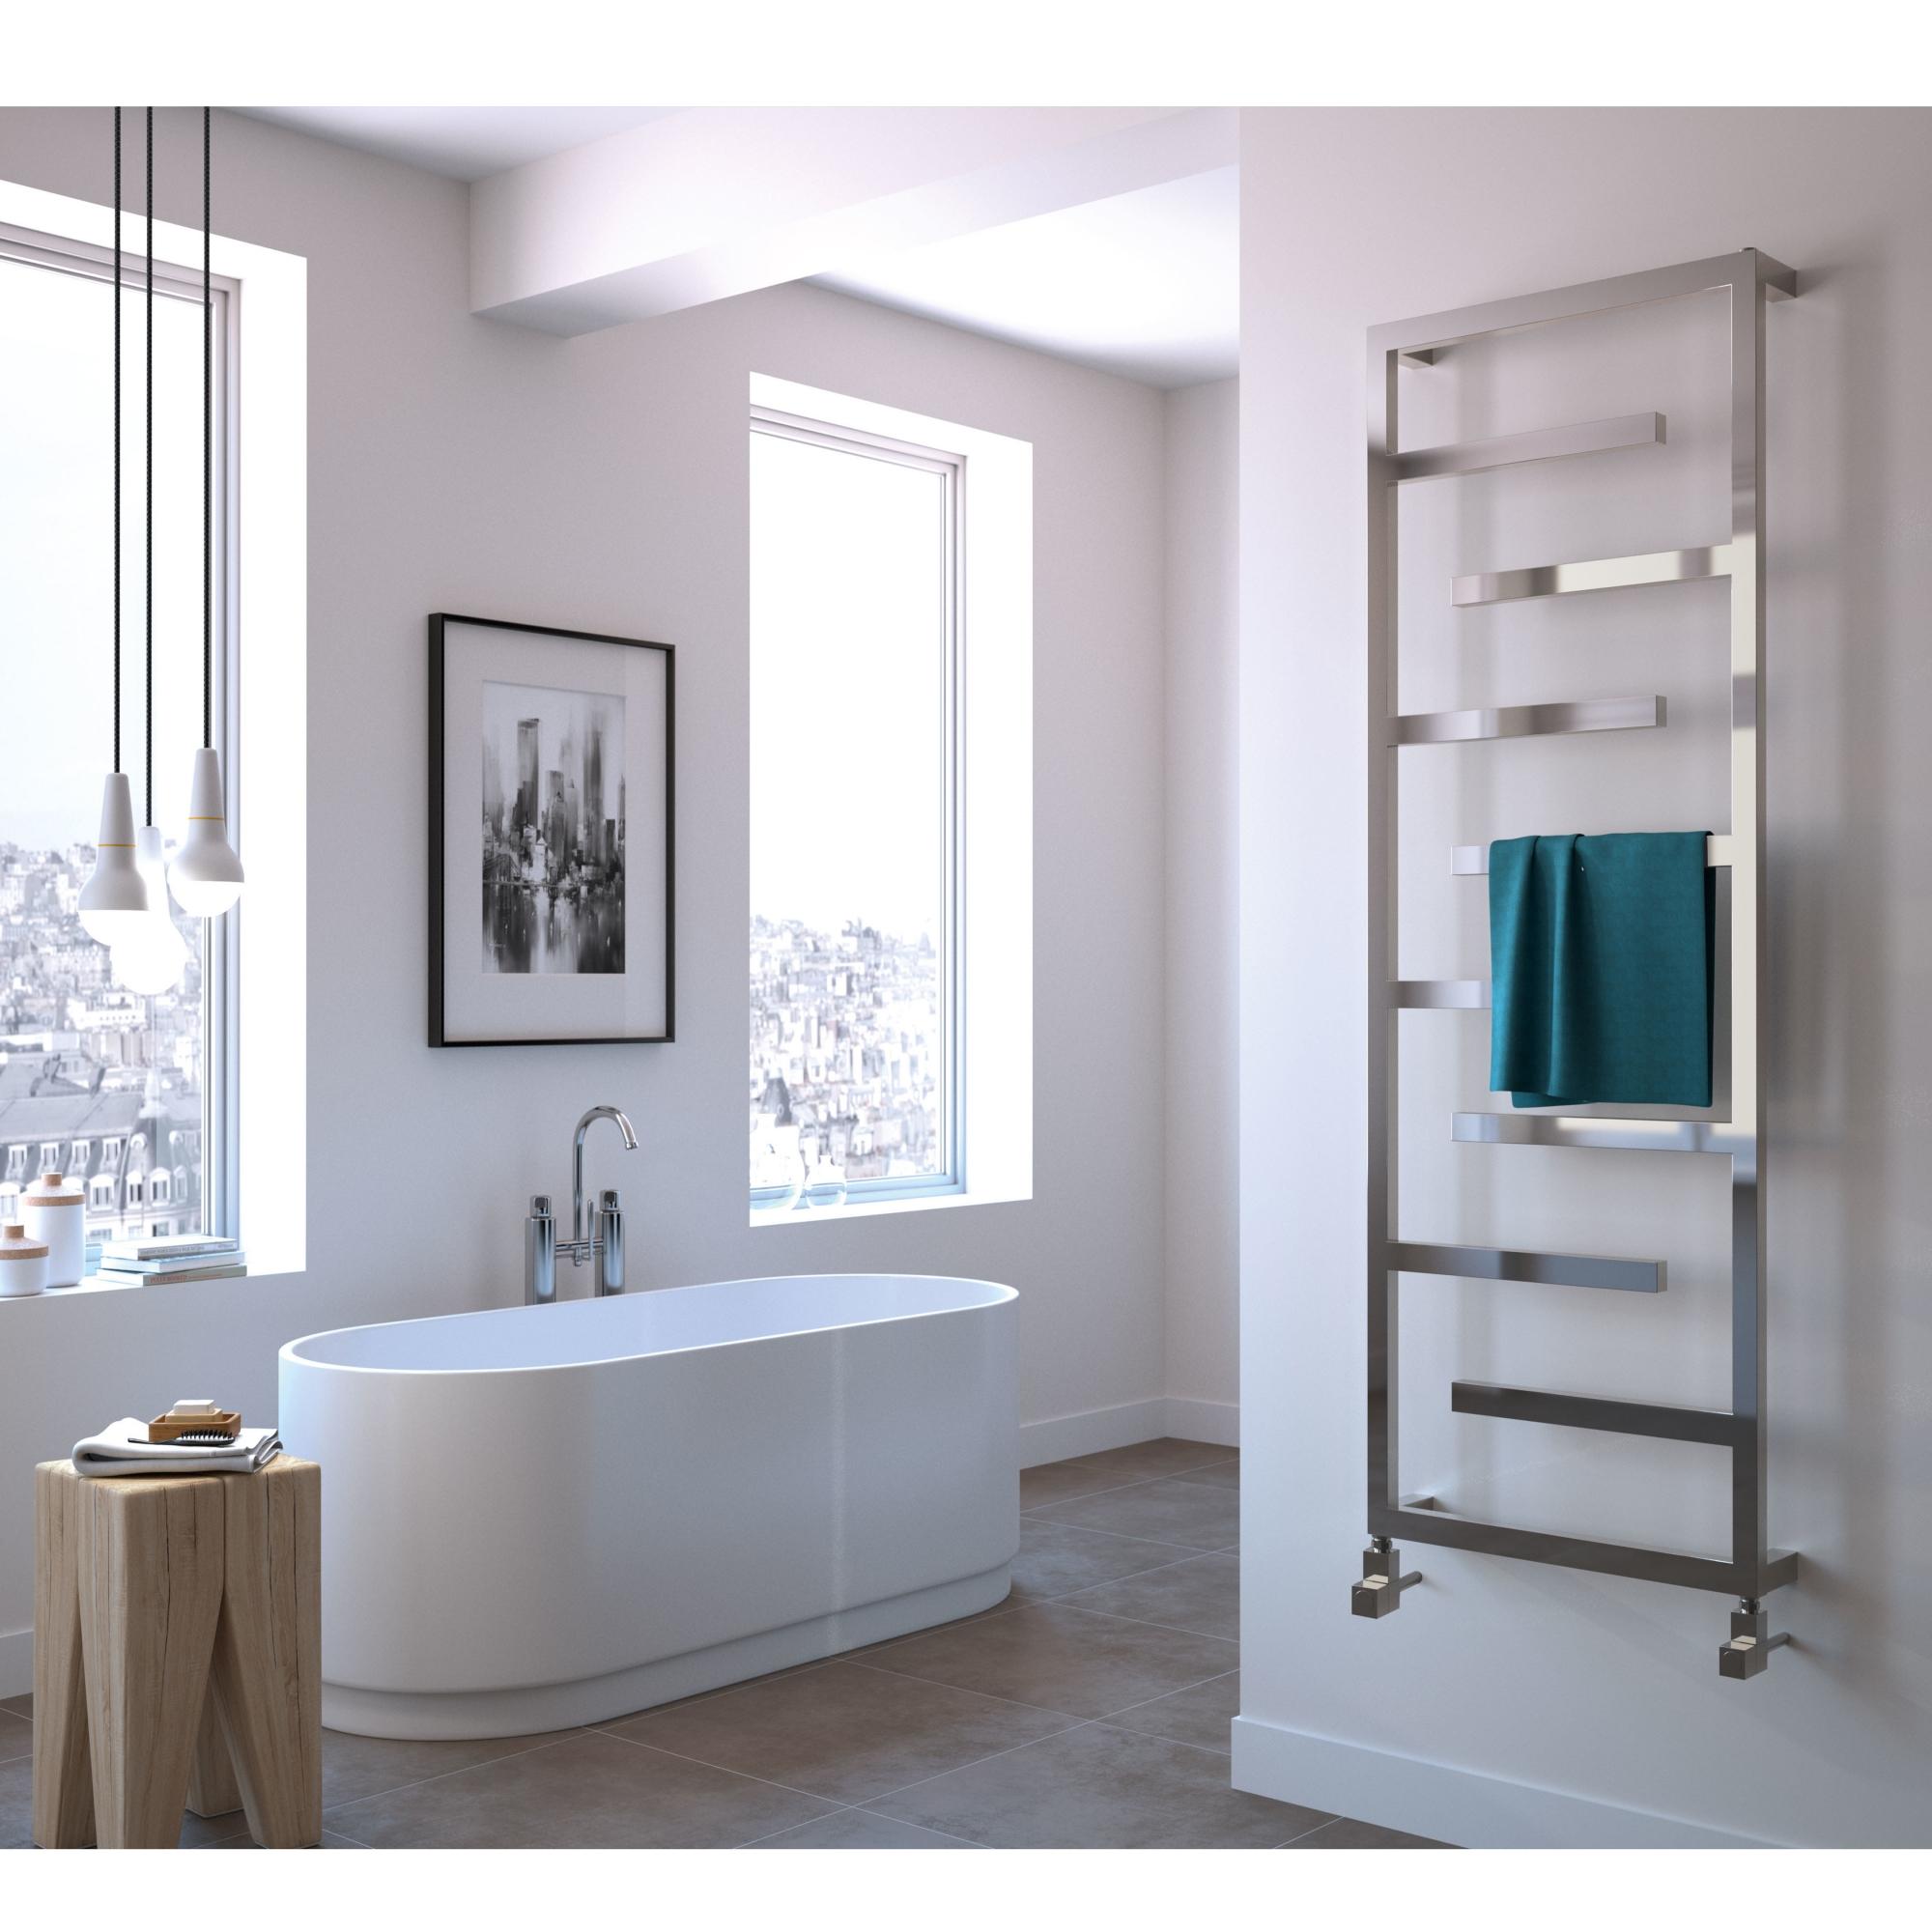 Radox Aztec Designer Heated Towel Rail 915mm H x 500mm W Stainless Steel-0